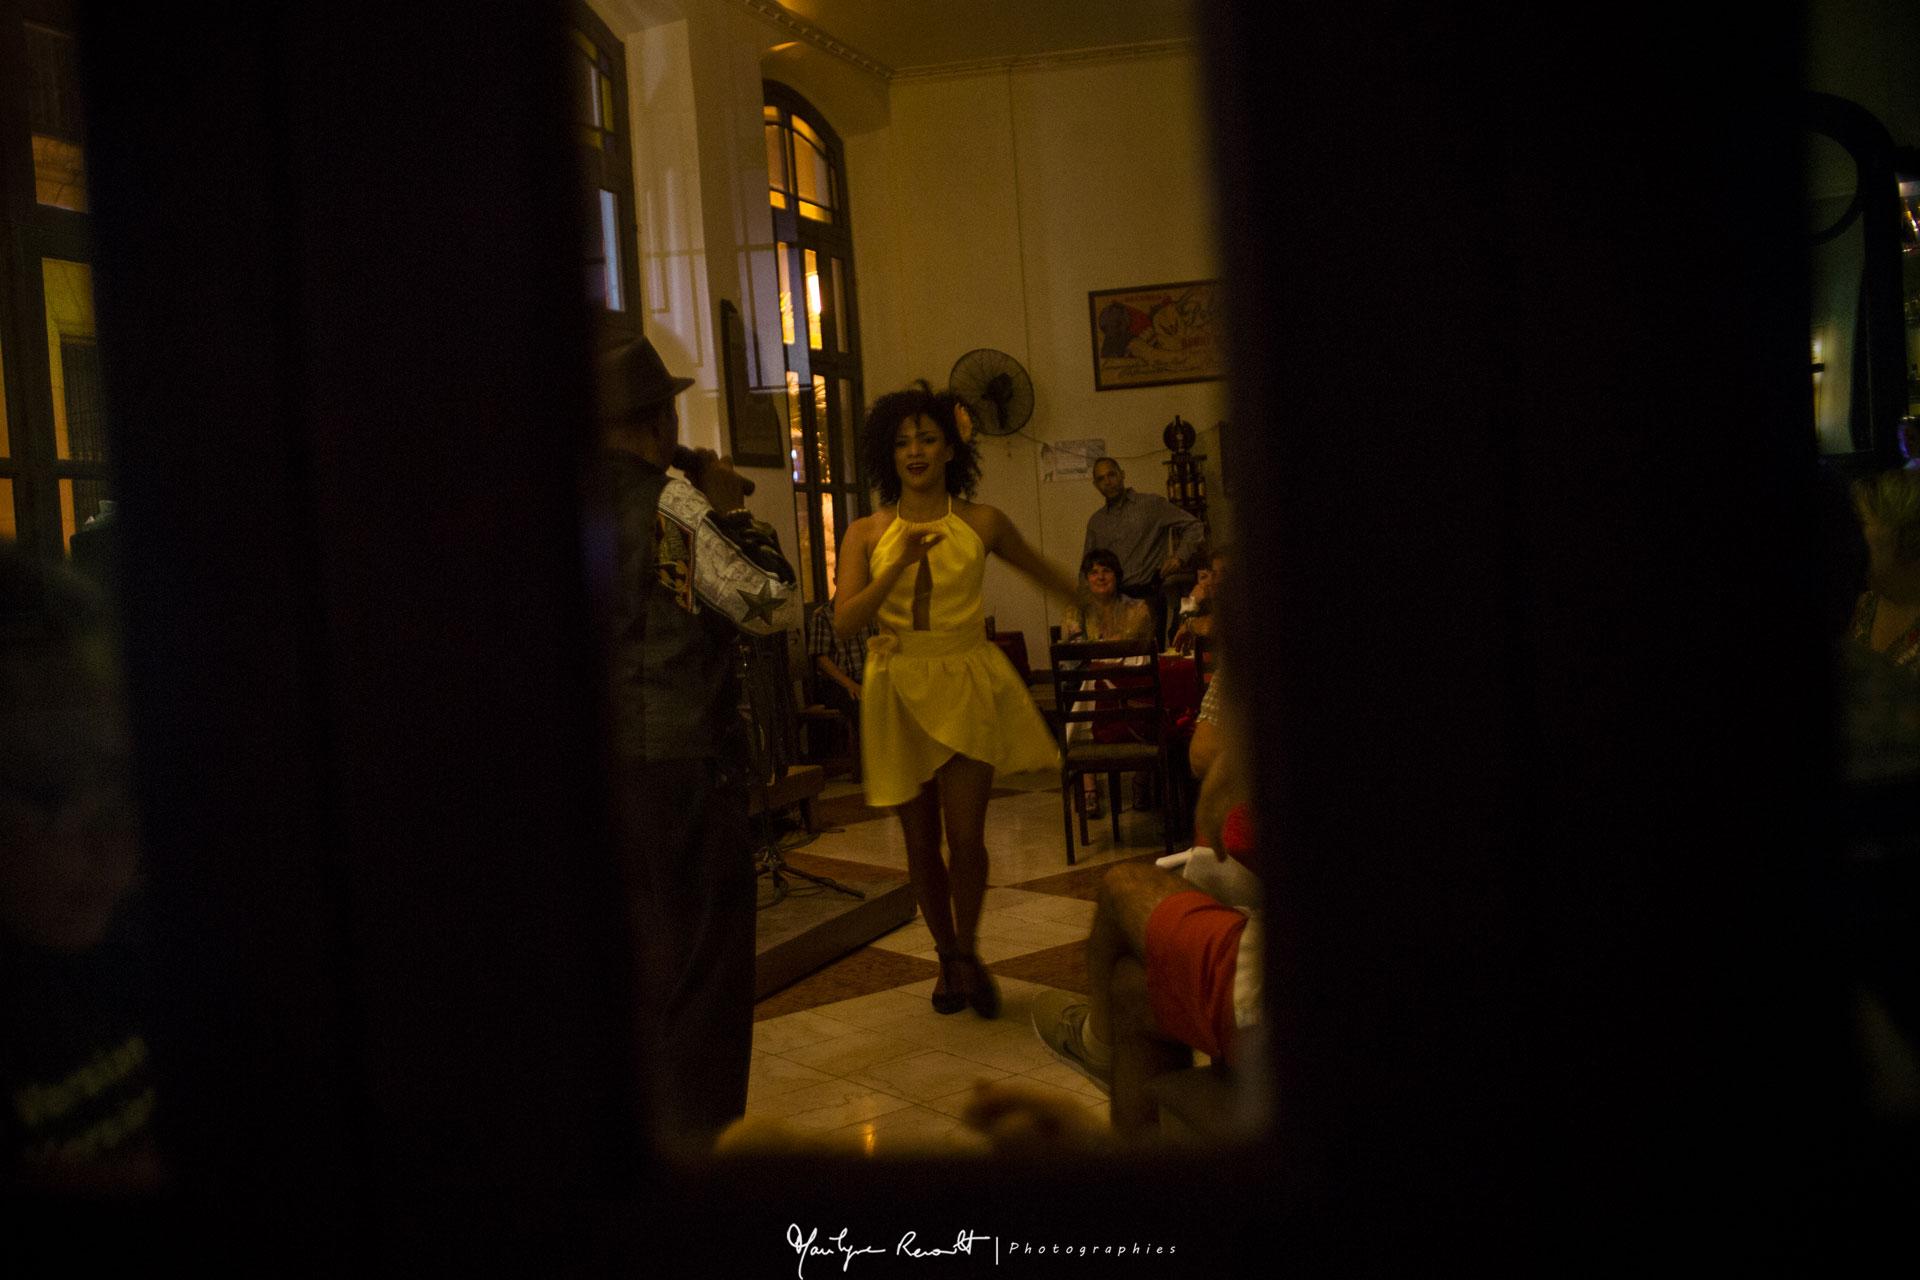 07-Cuba-marilyne renoult